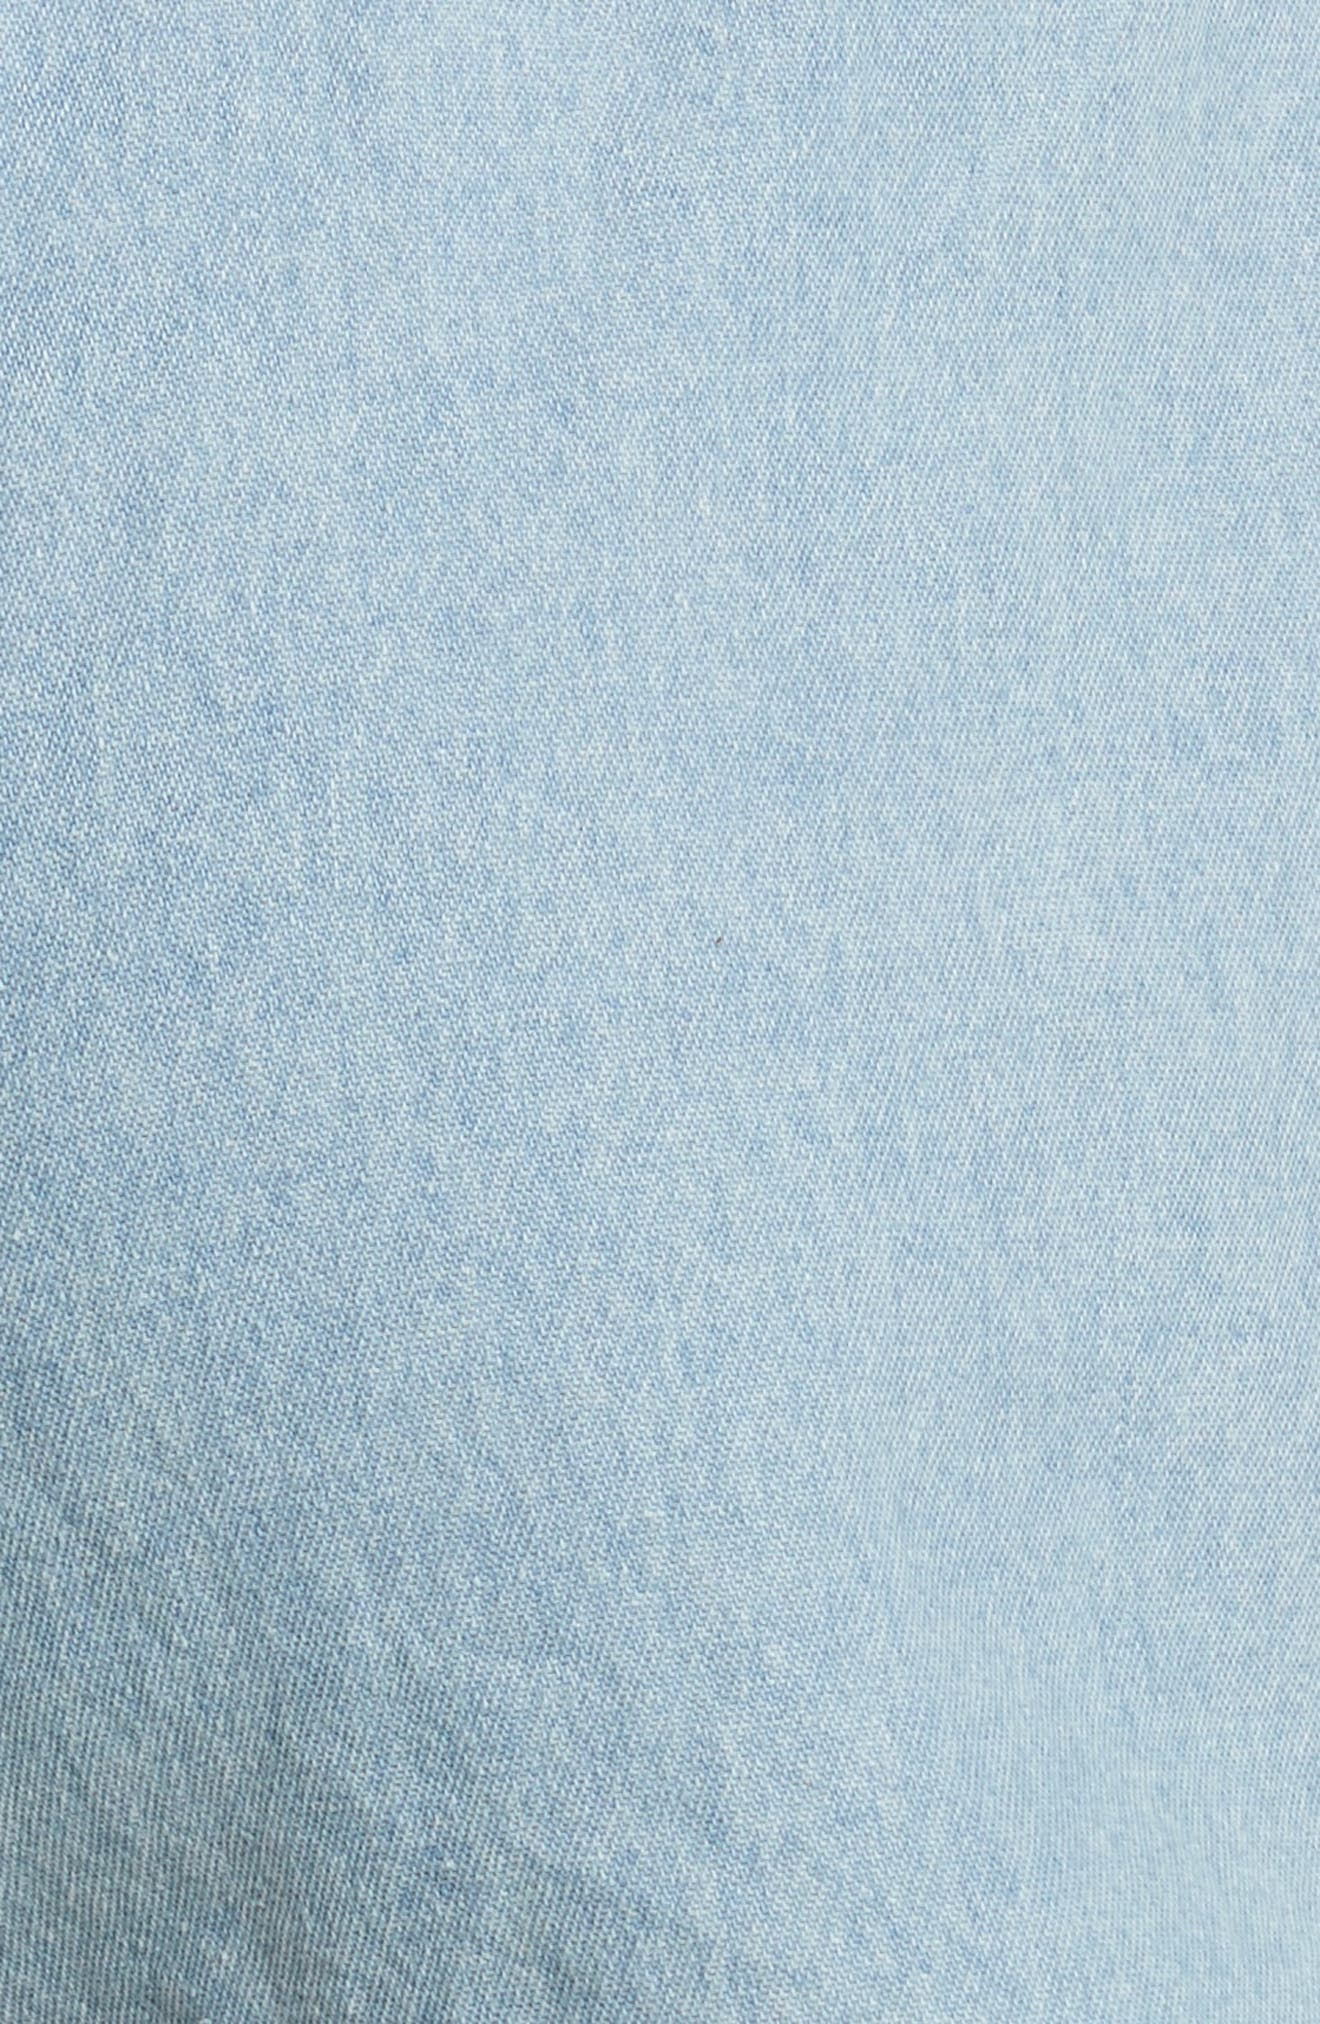 être cécile Rib Retro Shorts,                             Alternate thumbnail 5, color,                             LIGHT BLUE